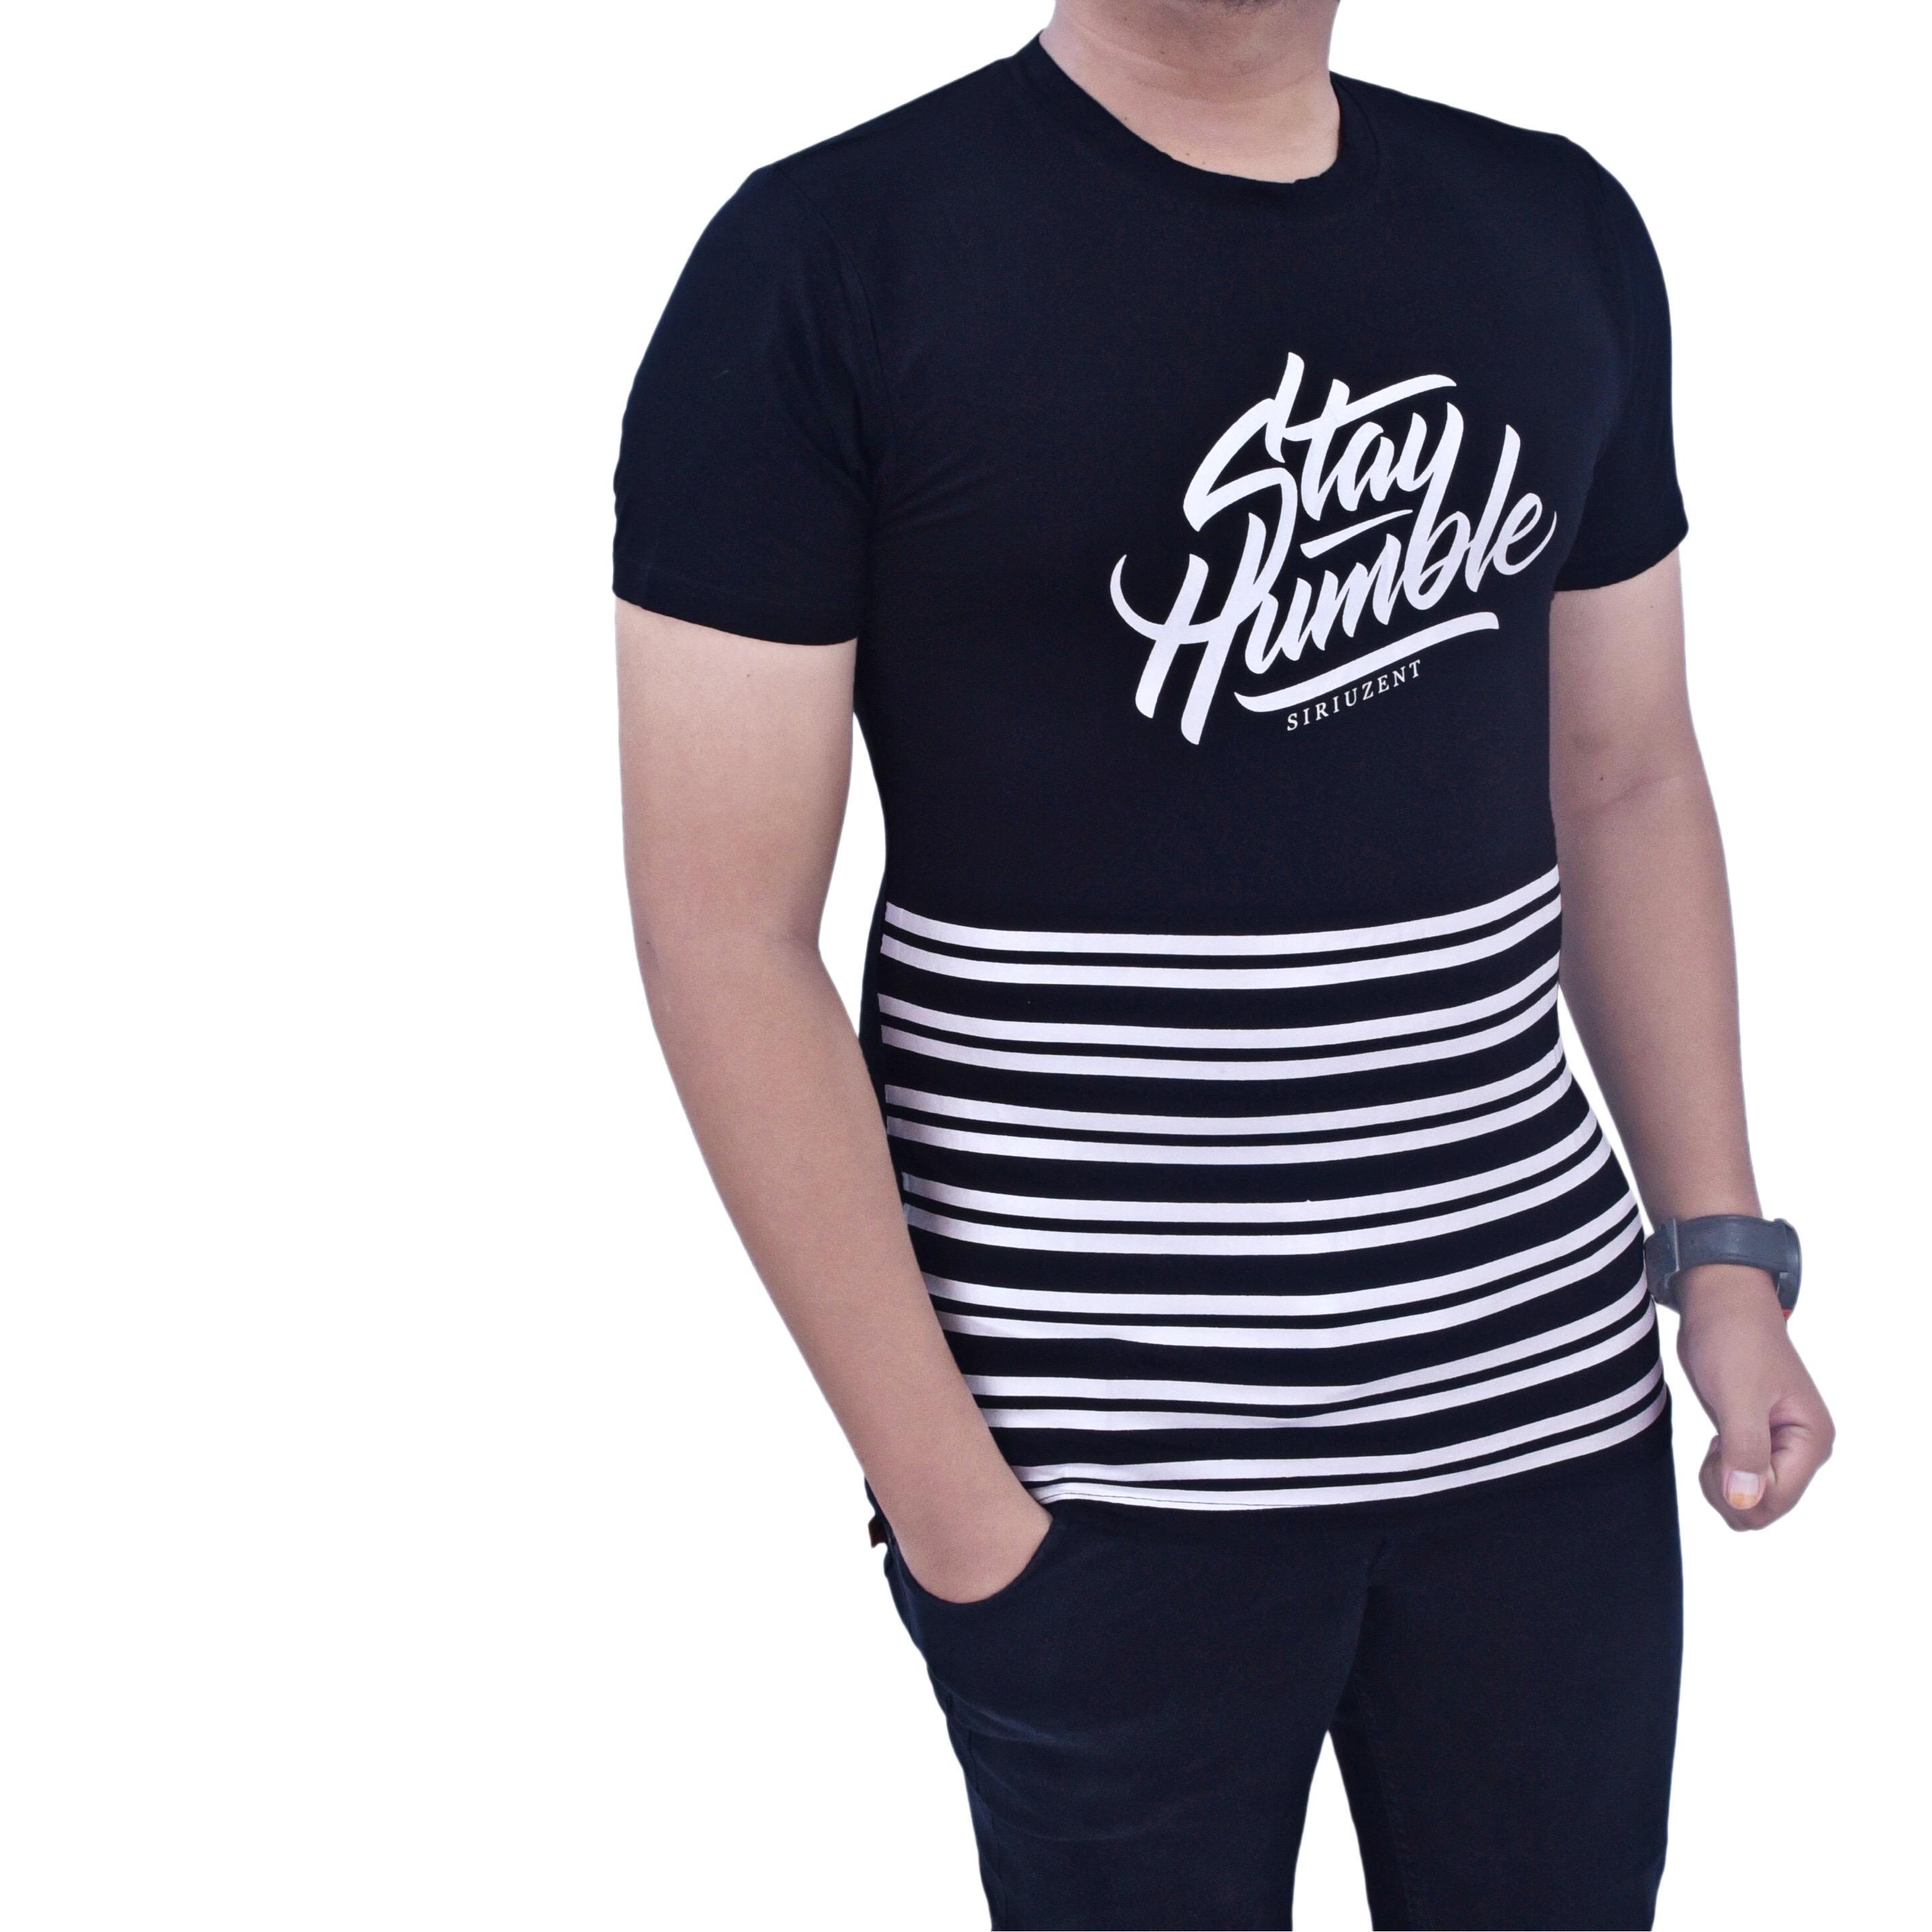 Dgm_Fashion1 Kaos Distro Lengan Pendek Hitam Premium /Kaos Baseball/Basebal Baju/ T-Shirt Baseball/Kaos Polos/Kaos Oblong/Kaos Distro/Kaos Casual/Kaos Hitam/Kaos Raglan/Kaos Polos/Kaos Baseball/Kaos Pendek/Kaos Panjang/Kaos Murah/T-Shirt Man IE 6065